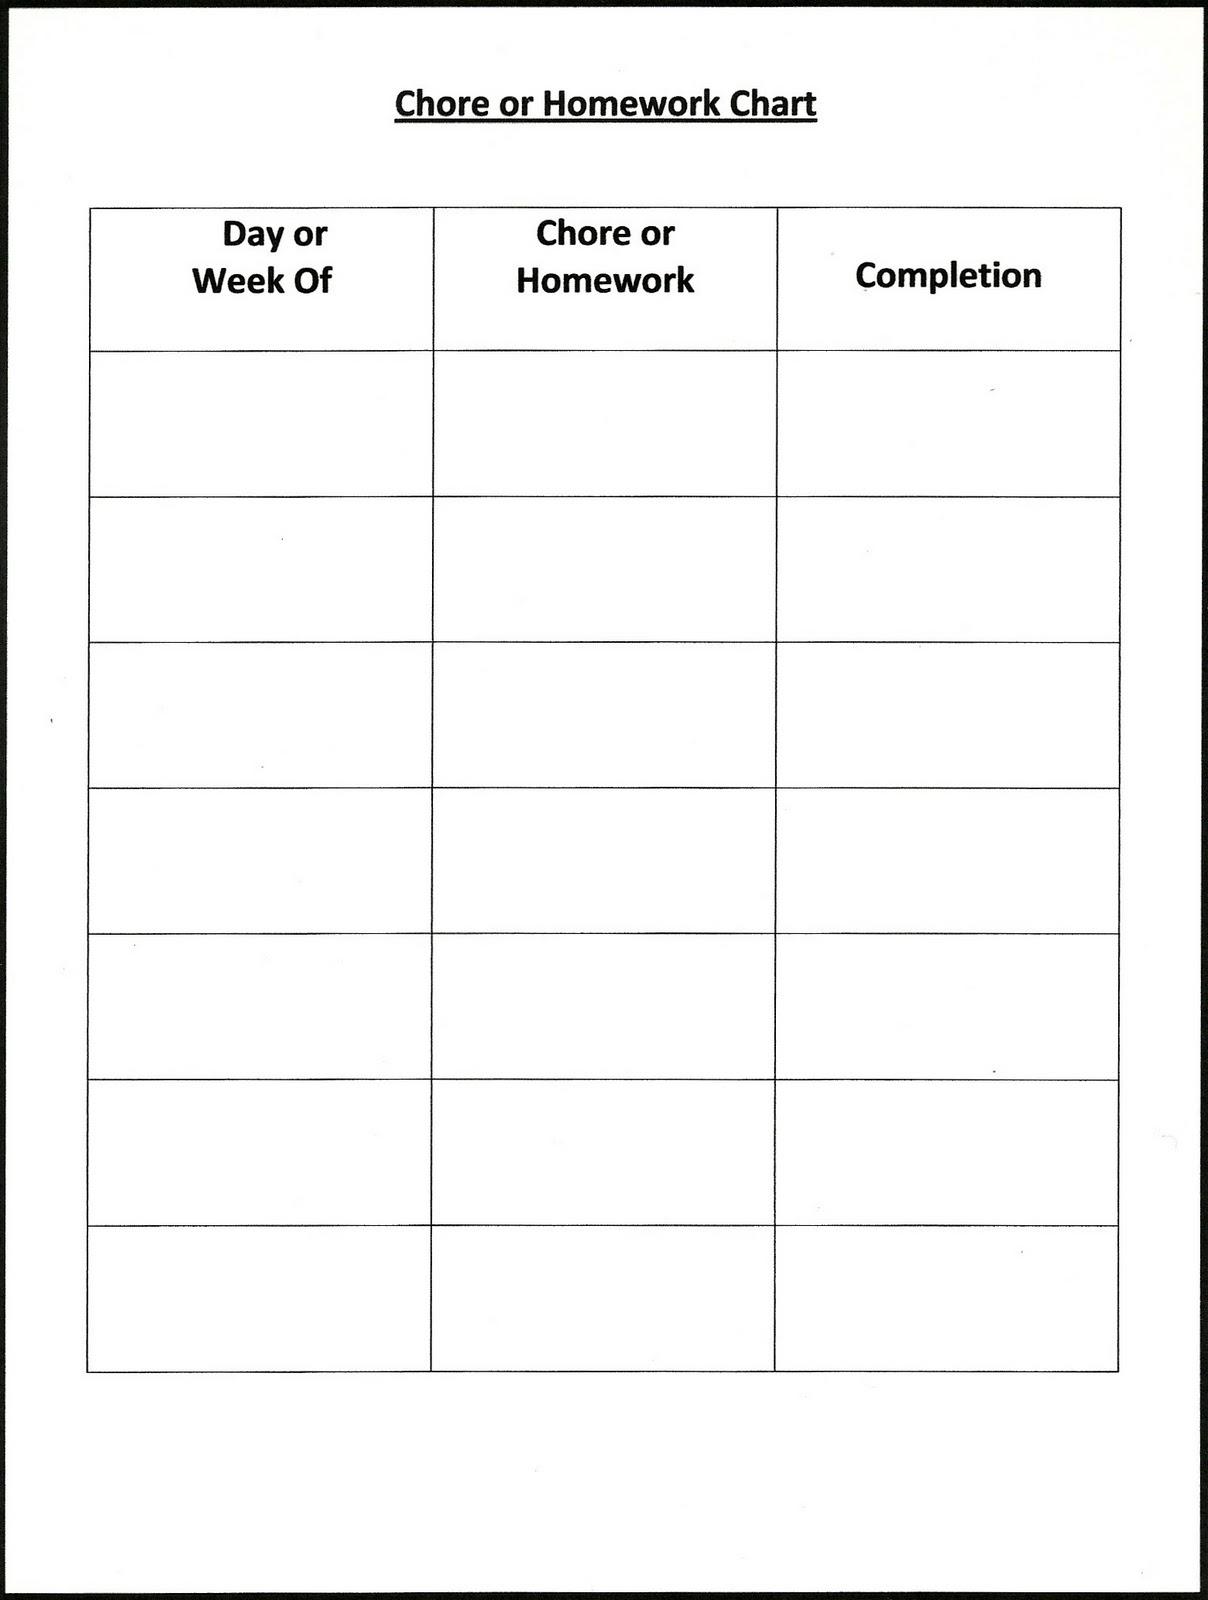 Printable childrens chore homework chart